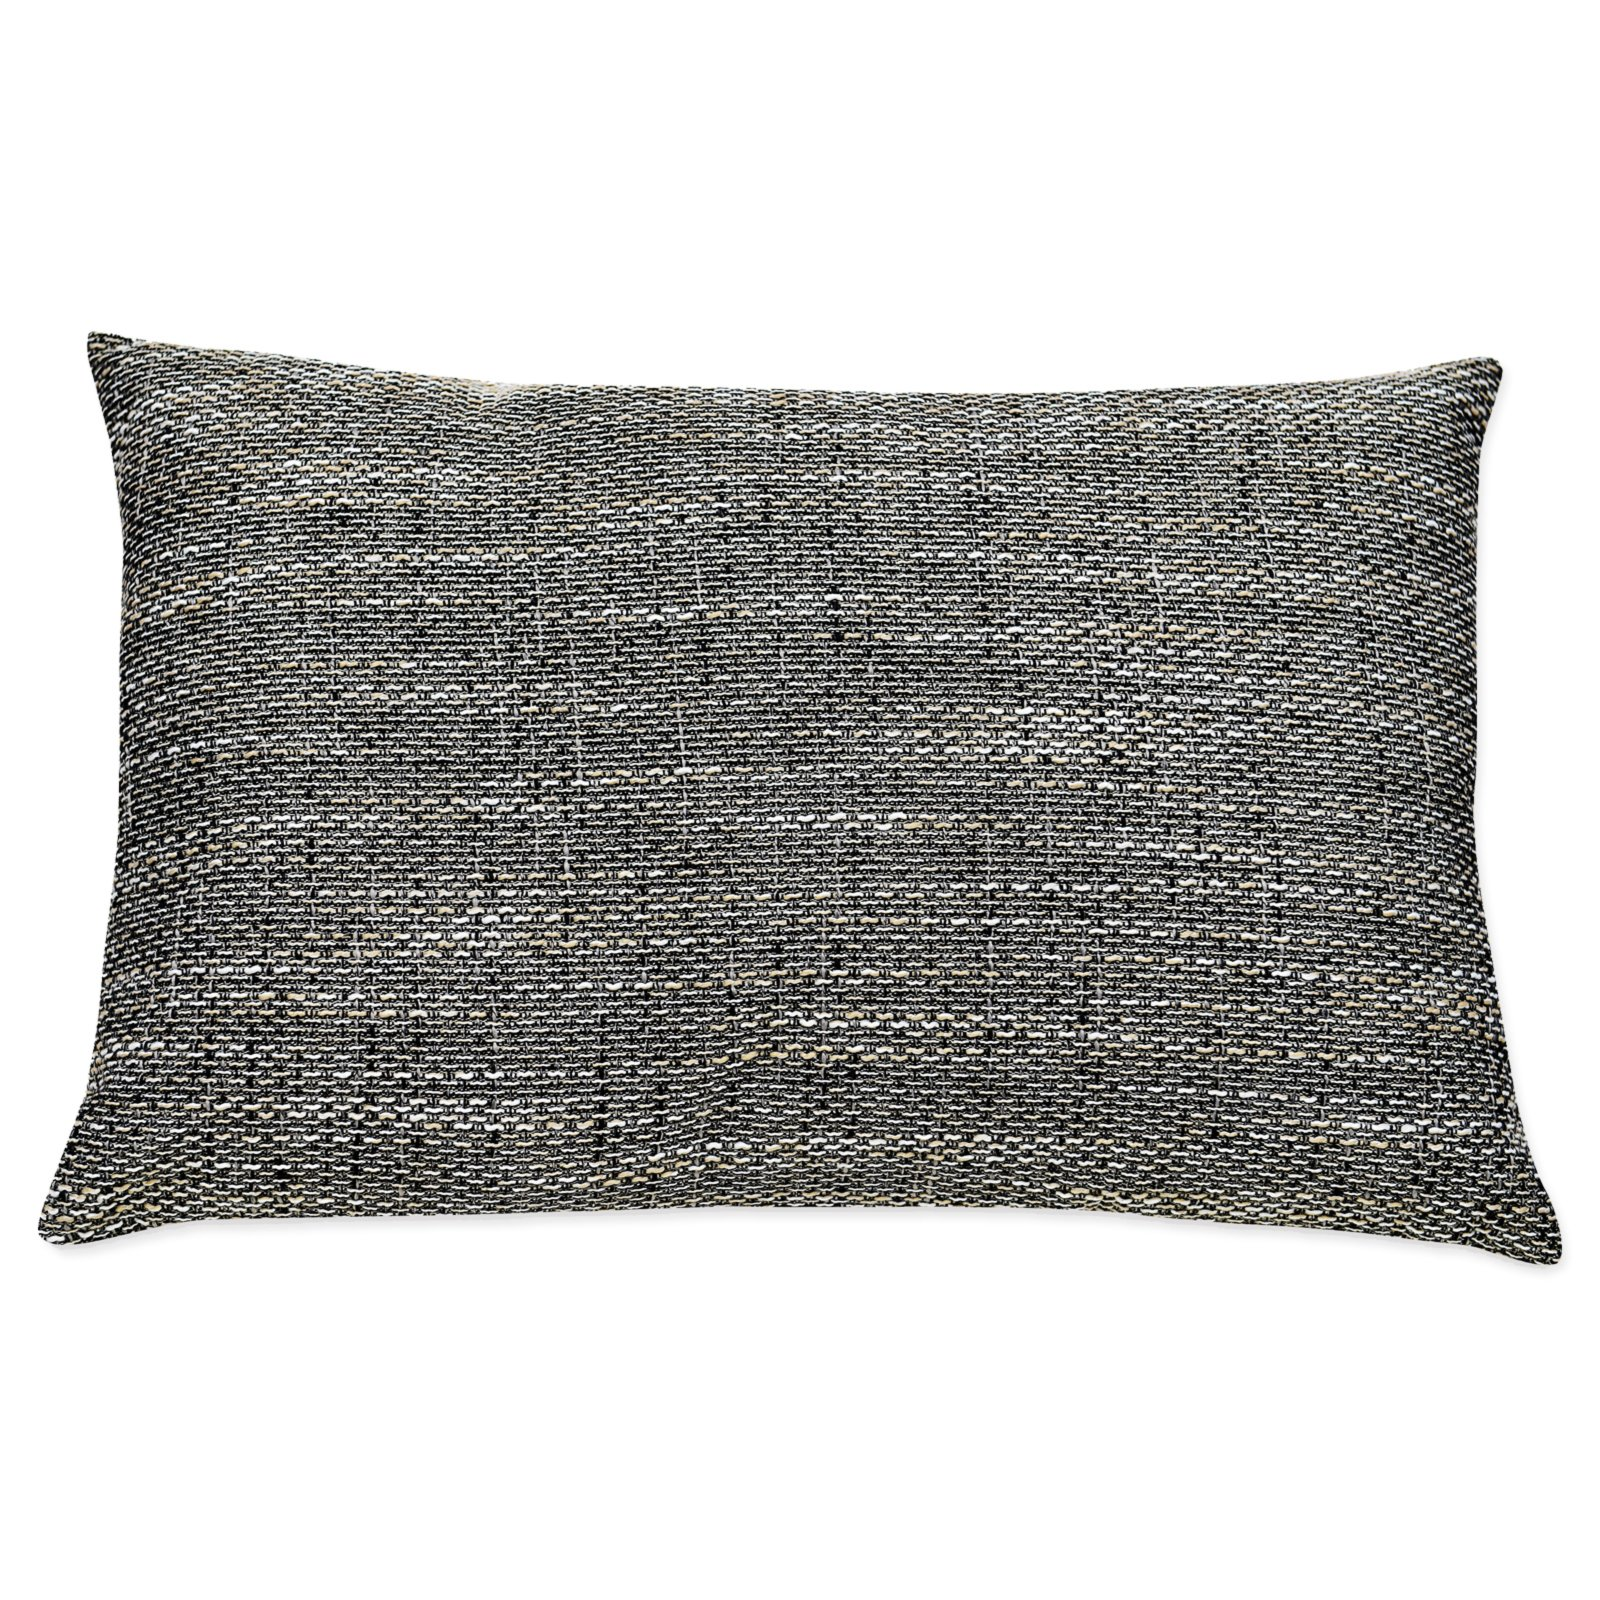 kissen caruso stahl mit f llung 40x60 cm sofakissen kissen heimtextilien deko. Black Bedroom Furniture Sets. Home Design Ideas